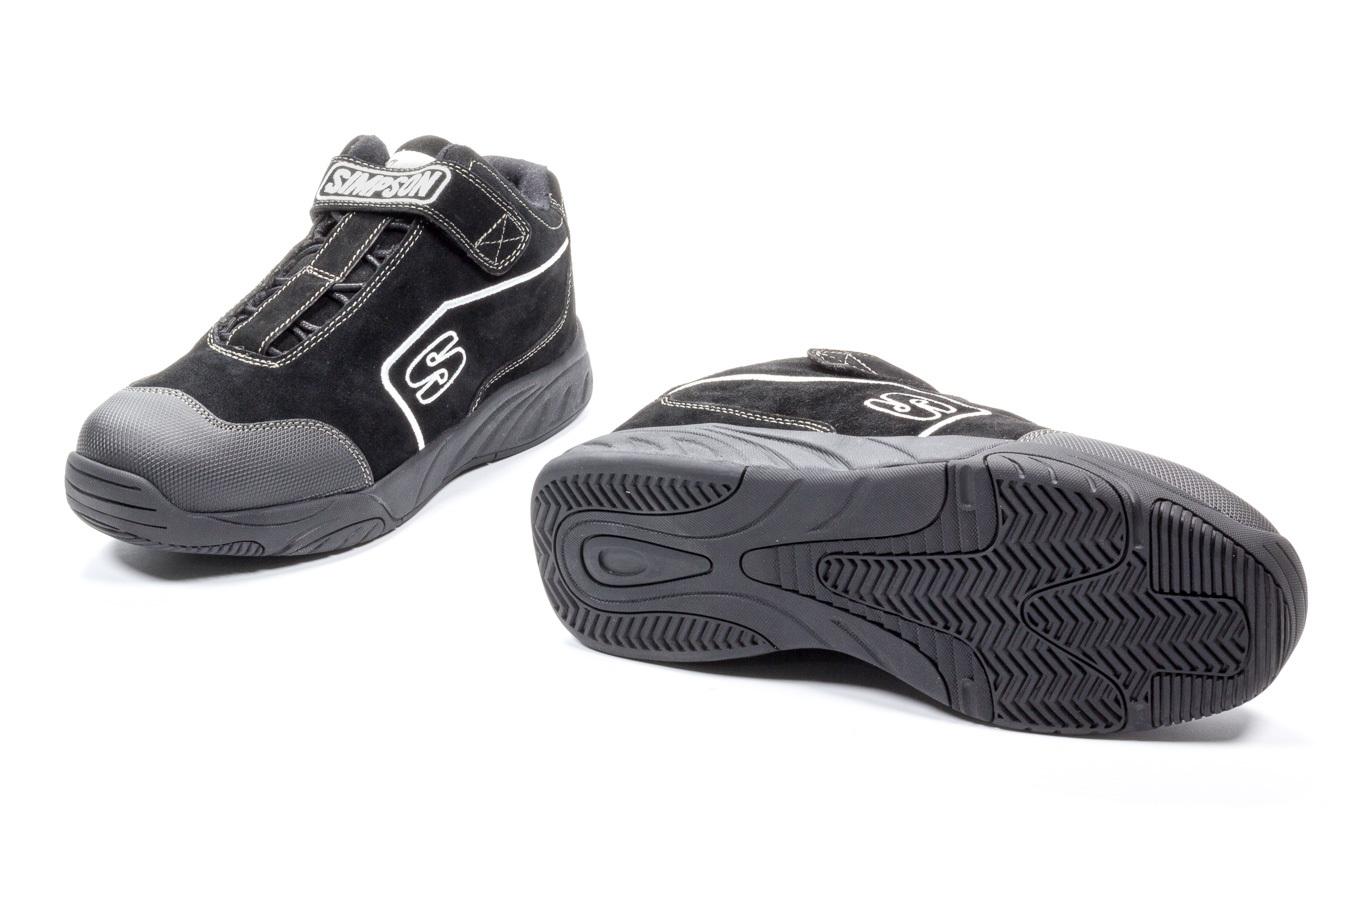 Simpson Safety Pit Box Shoe Size 8.5 Black